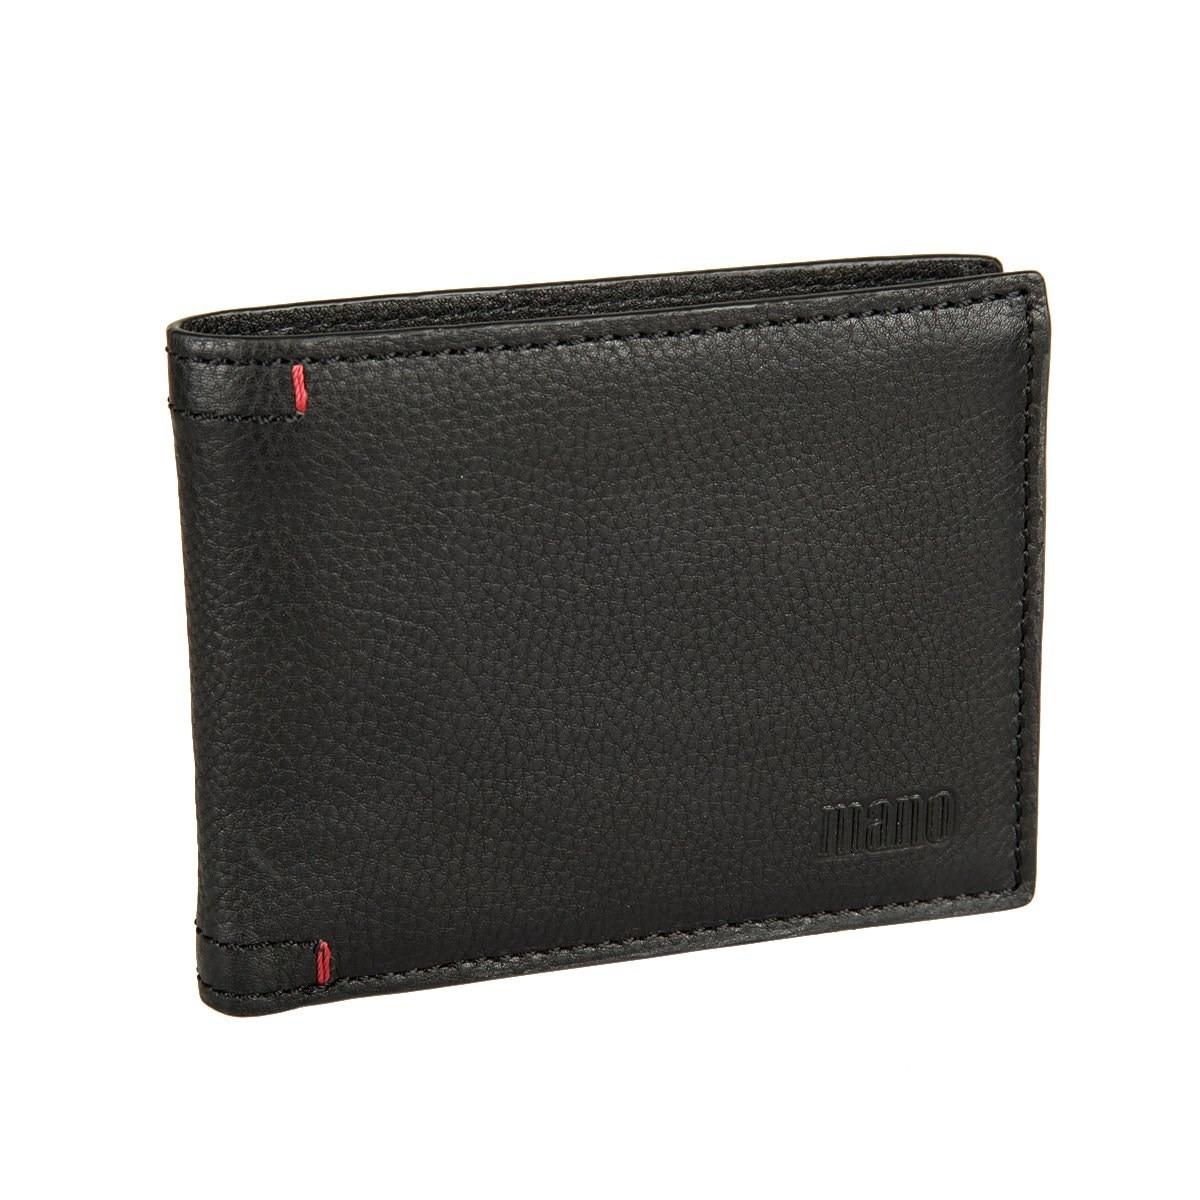 Coin Purse Mano 19952 black кошельки бумажники и портмоне mano 19952 black